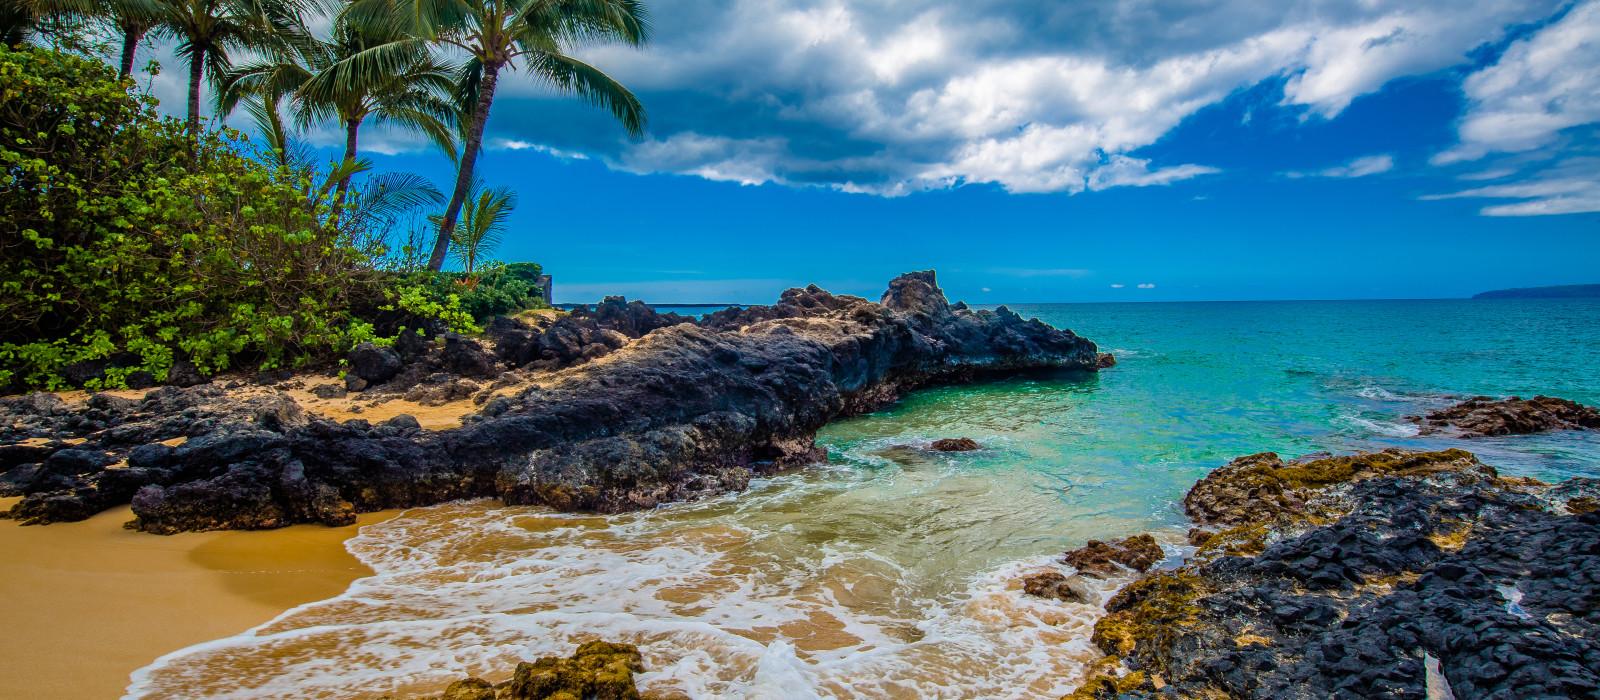 Destination Maui Hawaii